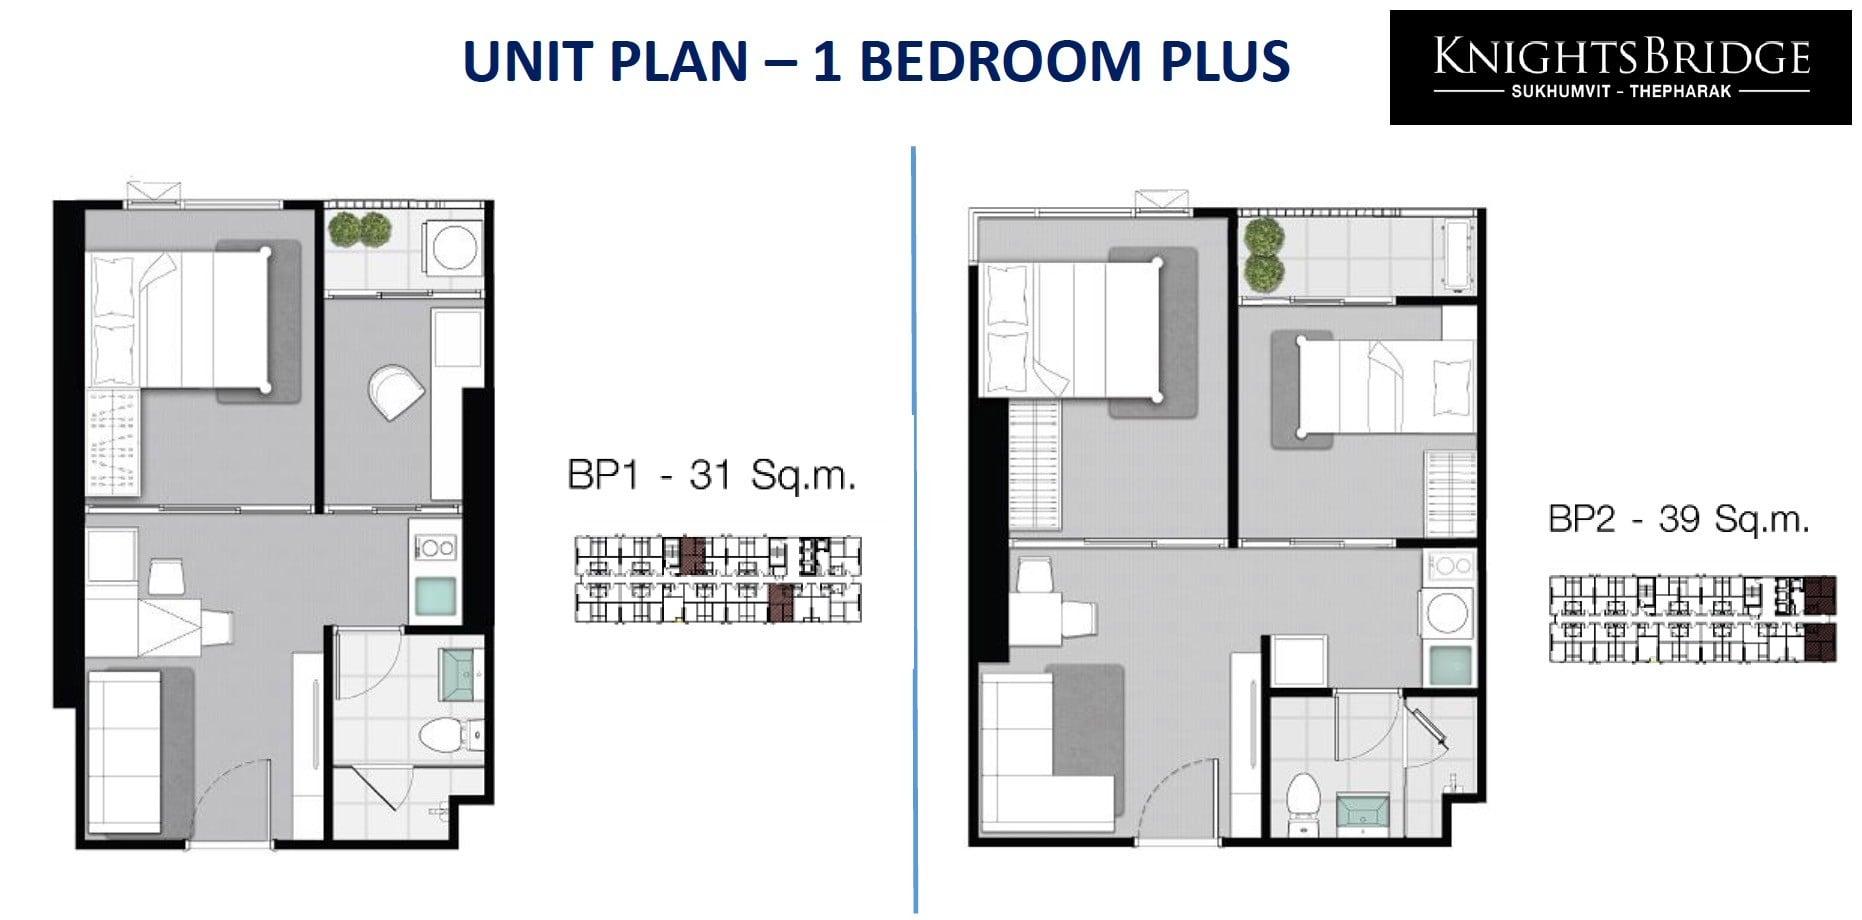 Knightsbridge-sukhumvit-thepharak-Floor plan 1BR plus